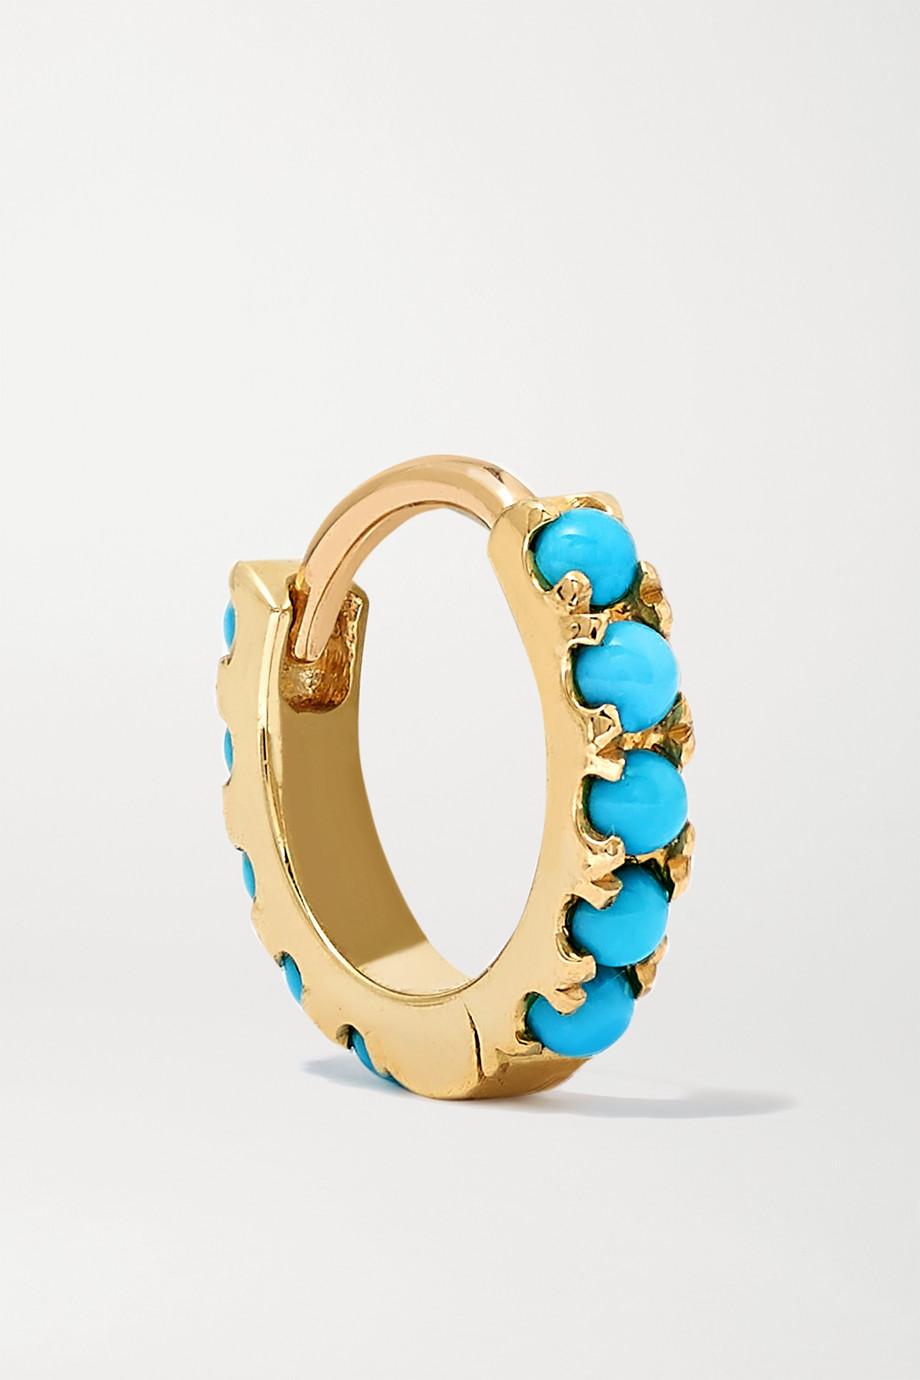 MARIA TASH 6.5mm 14-karat gold turquoise hoop earring